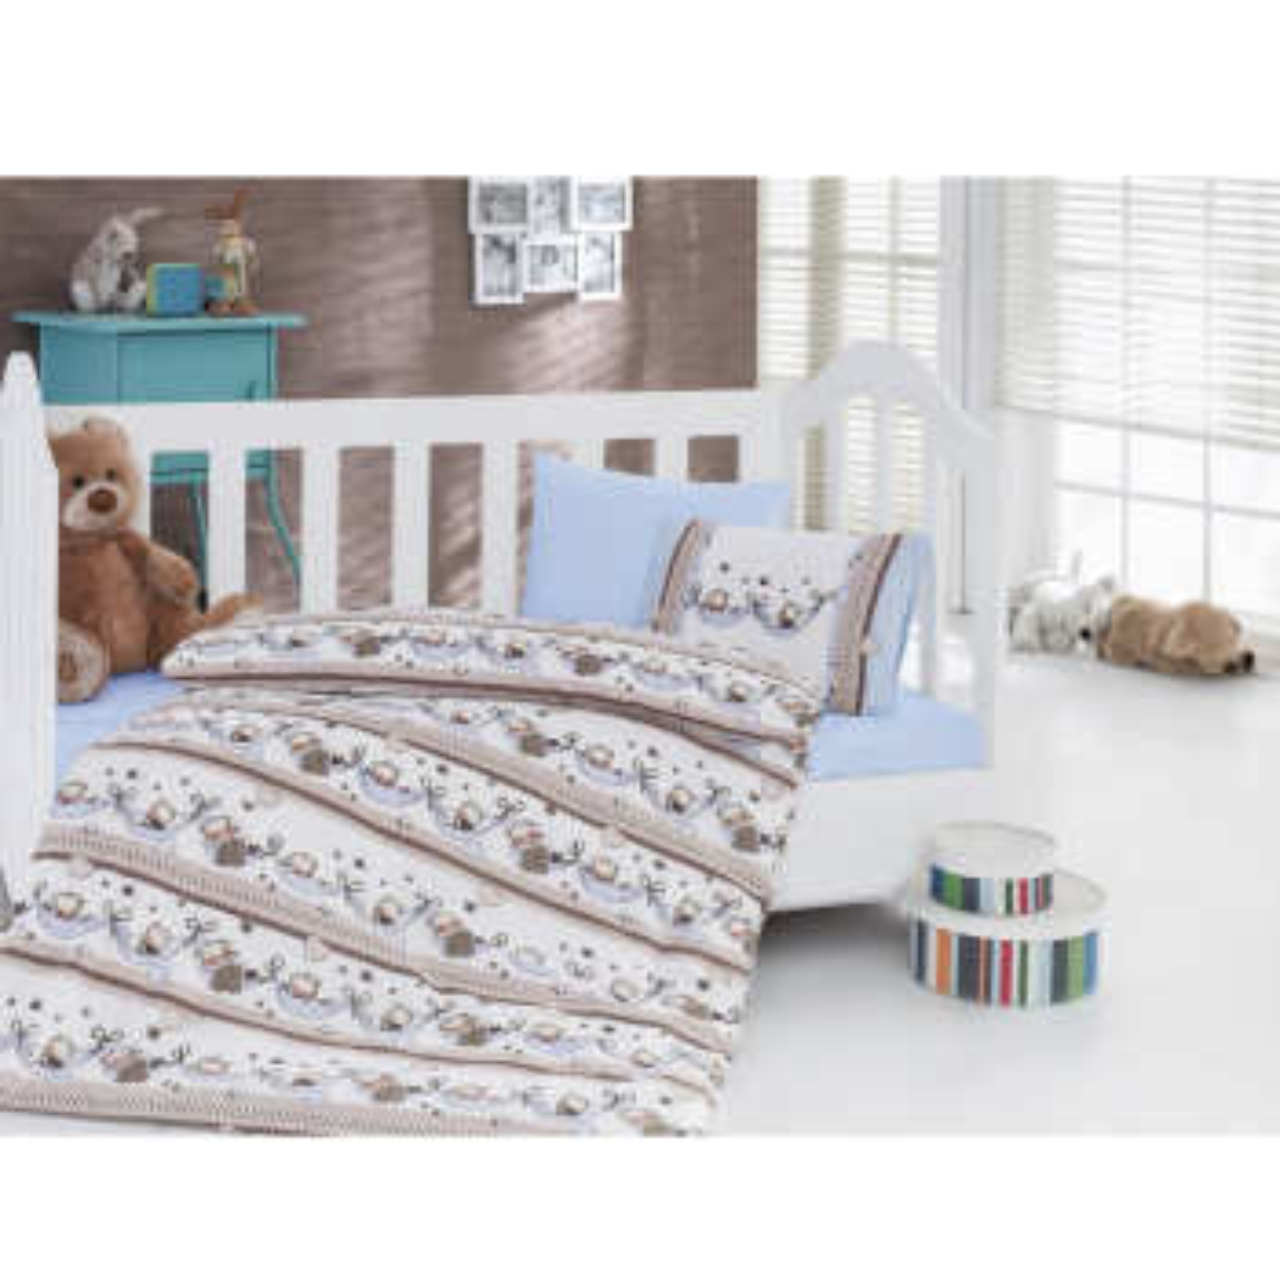 سرویس خواب 4 تکه کودک کاتن باکس  مدل   Blue Swing | Cotton Box Blue Swing Child Bedsheet Set 1 Person 4 Pcs